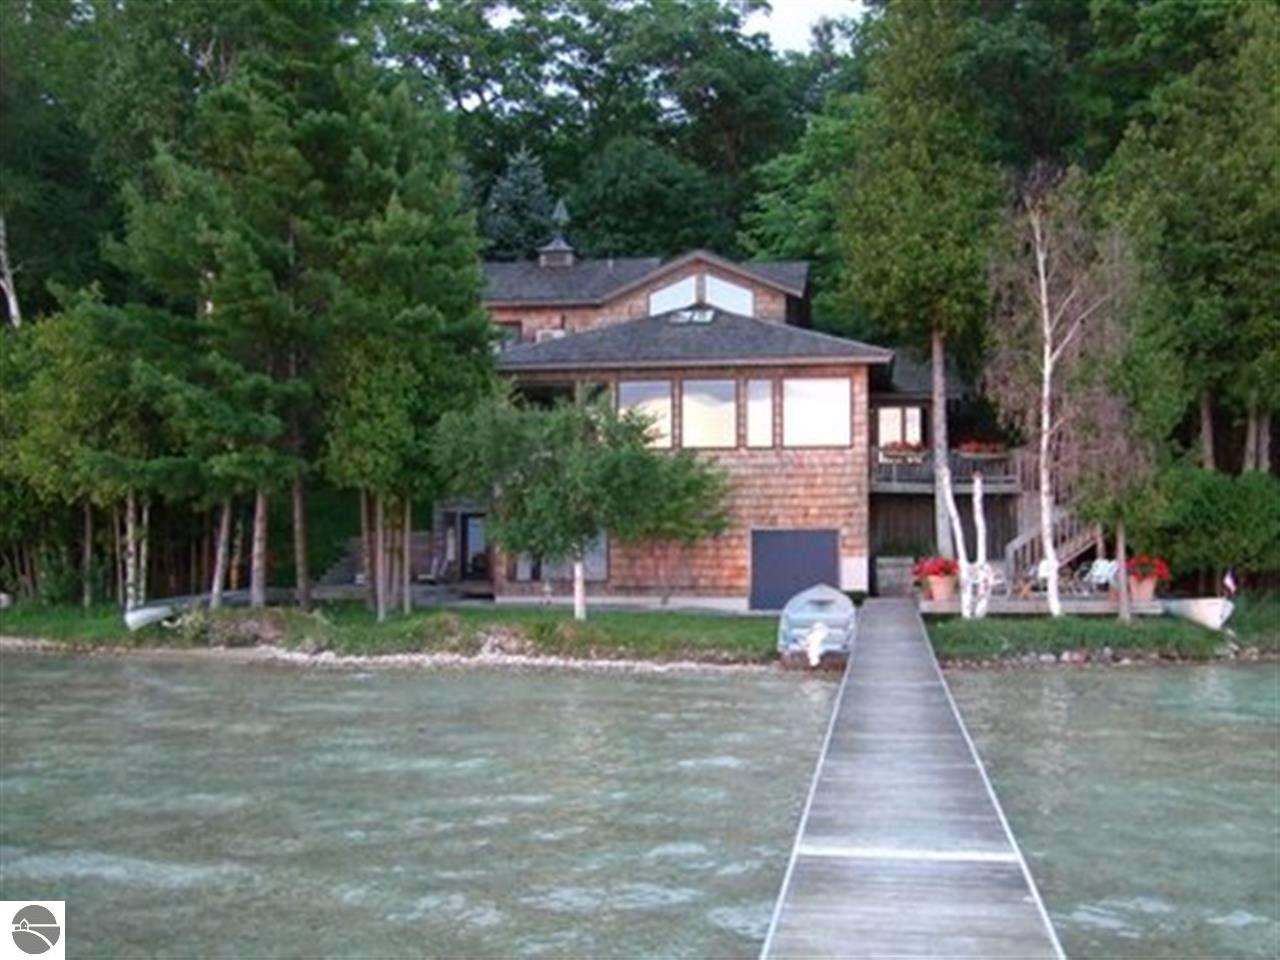 glen lake michigan waterfront real estate for sale